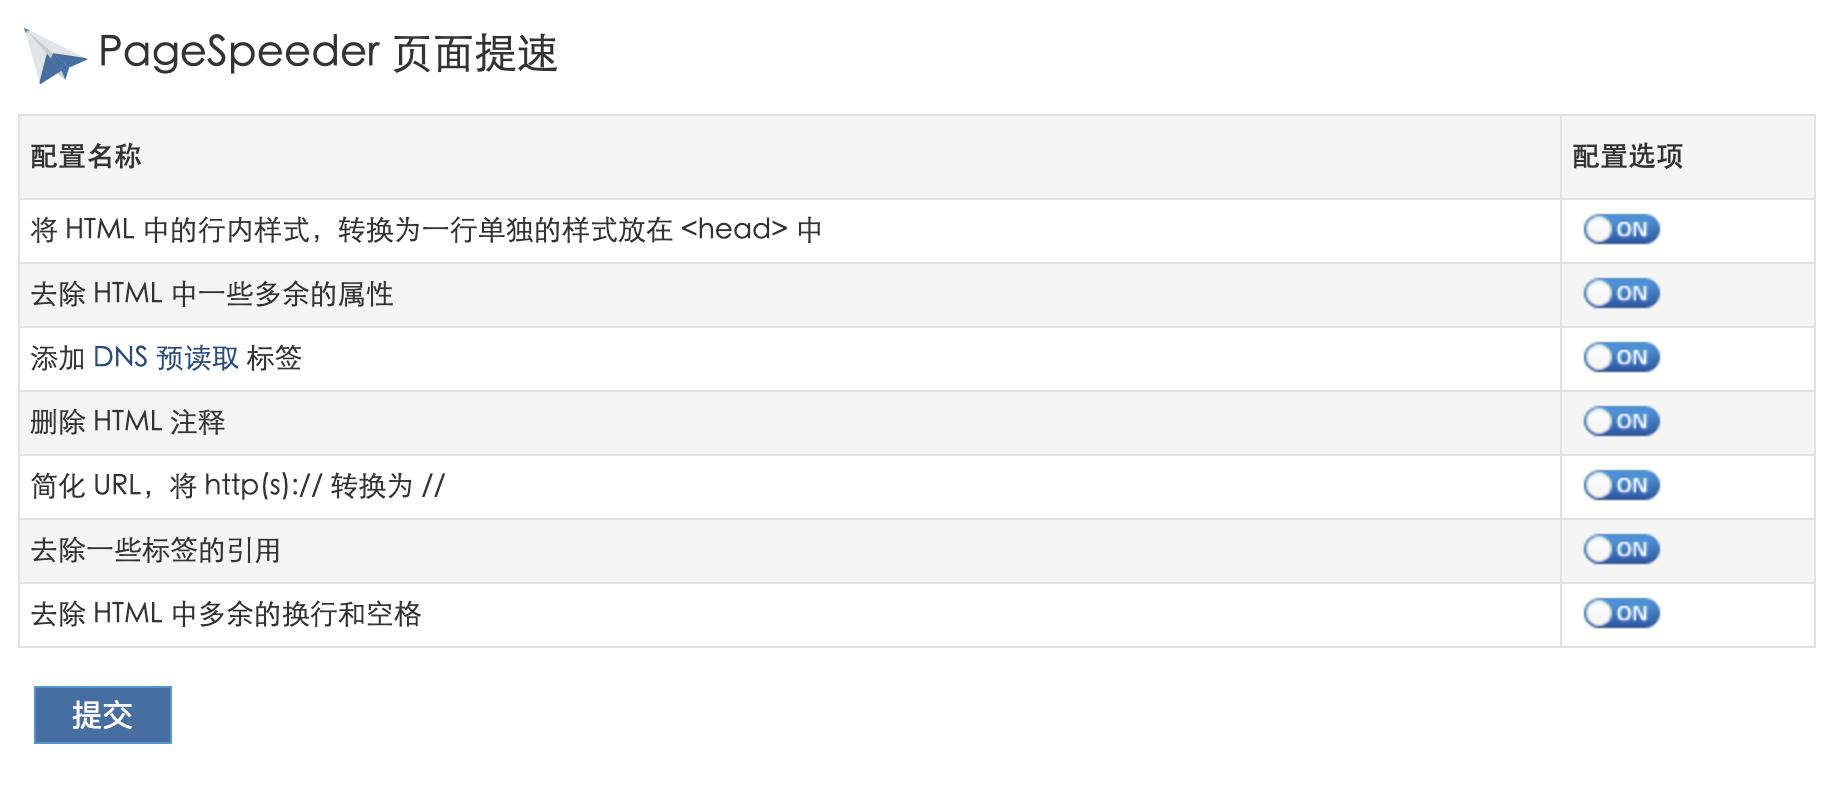 zblog php页面提速插件PageSpeeder  第1张